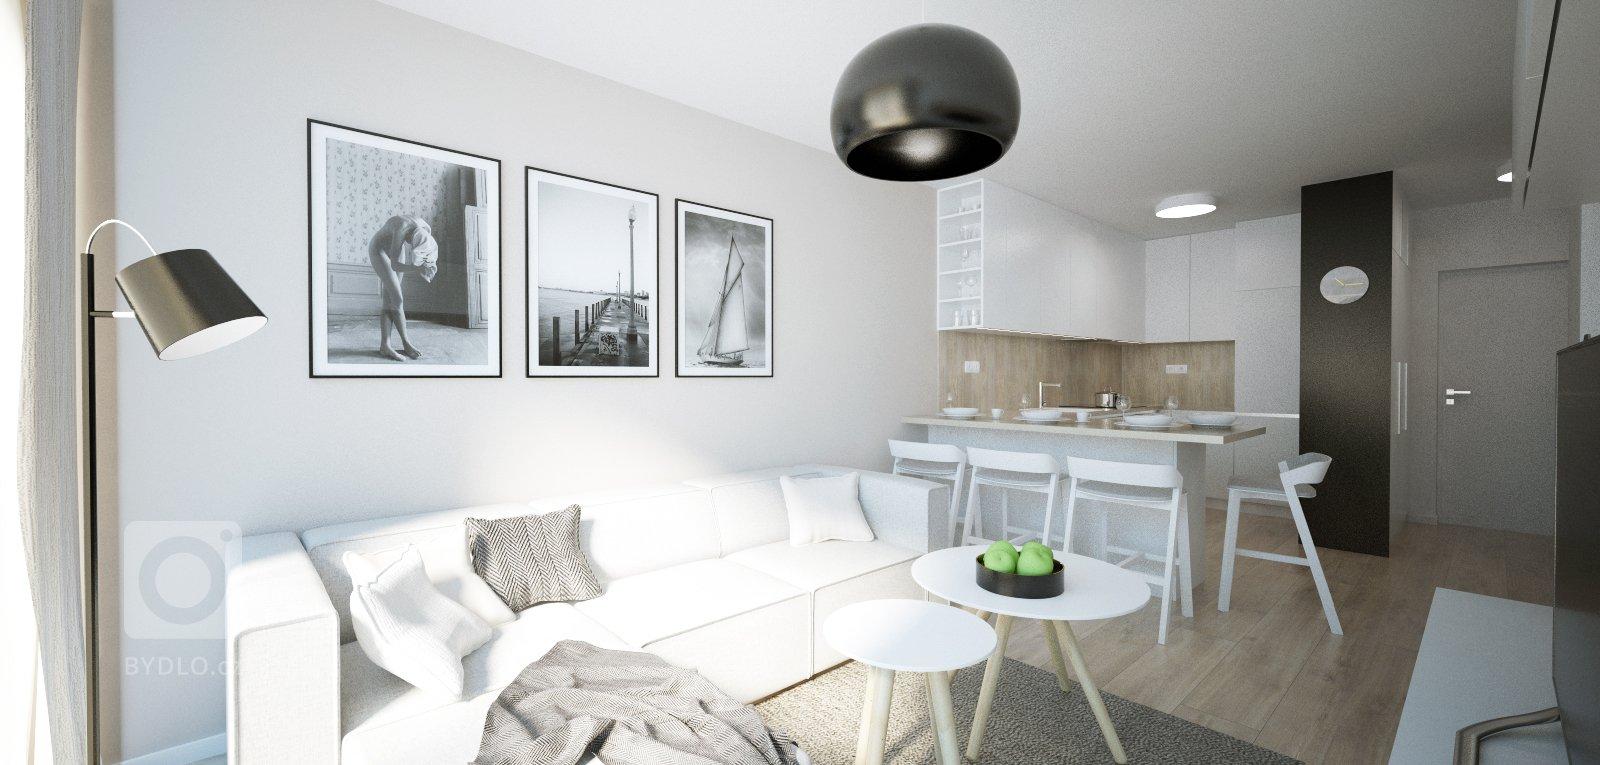 2-izbový byt v Bratislave